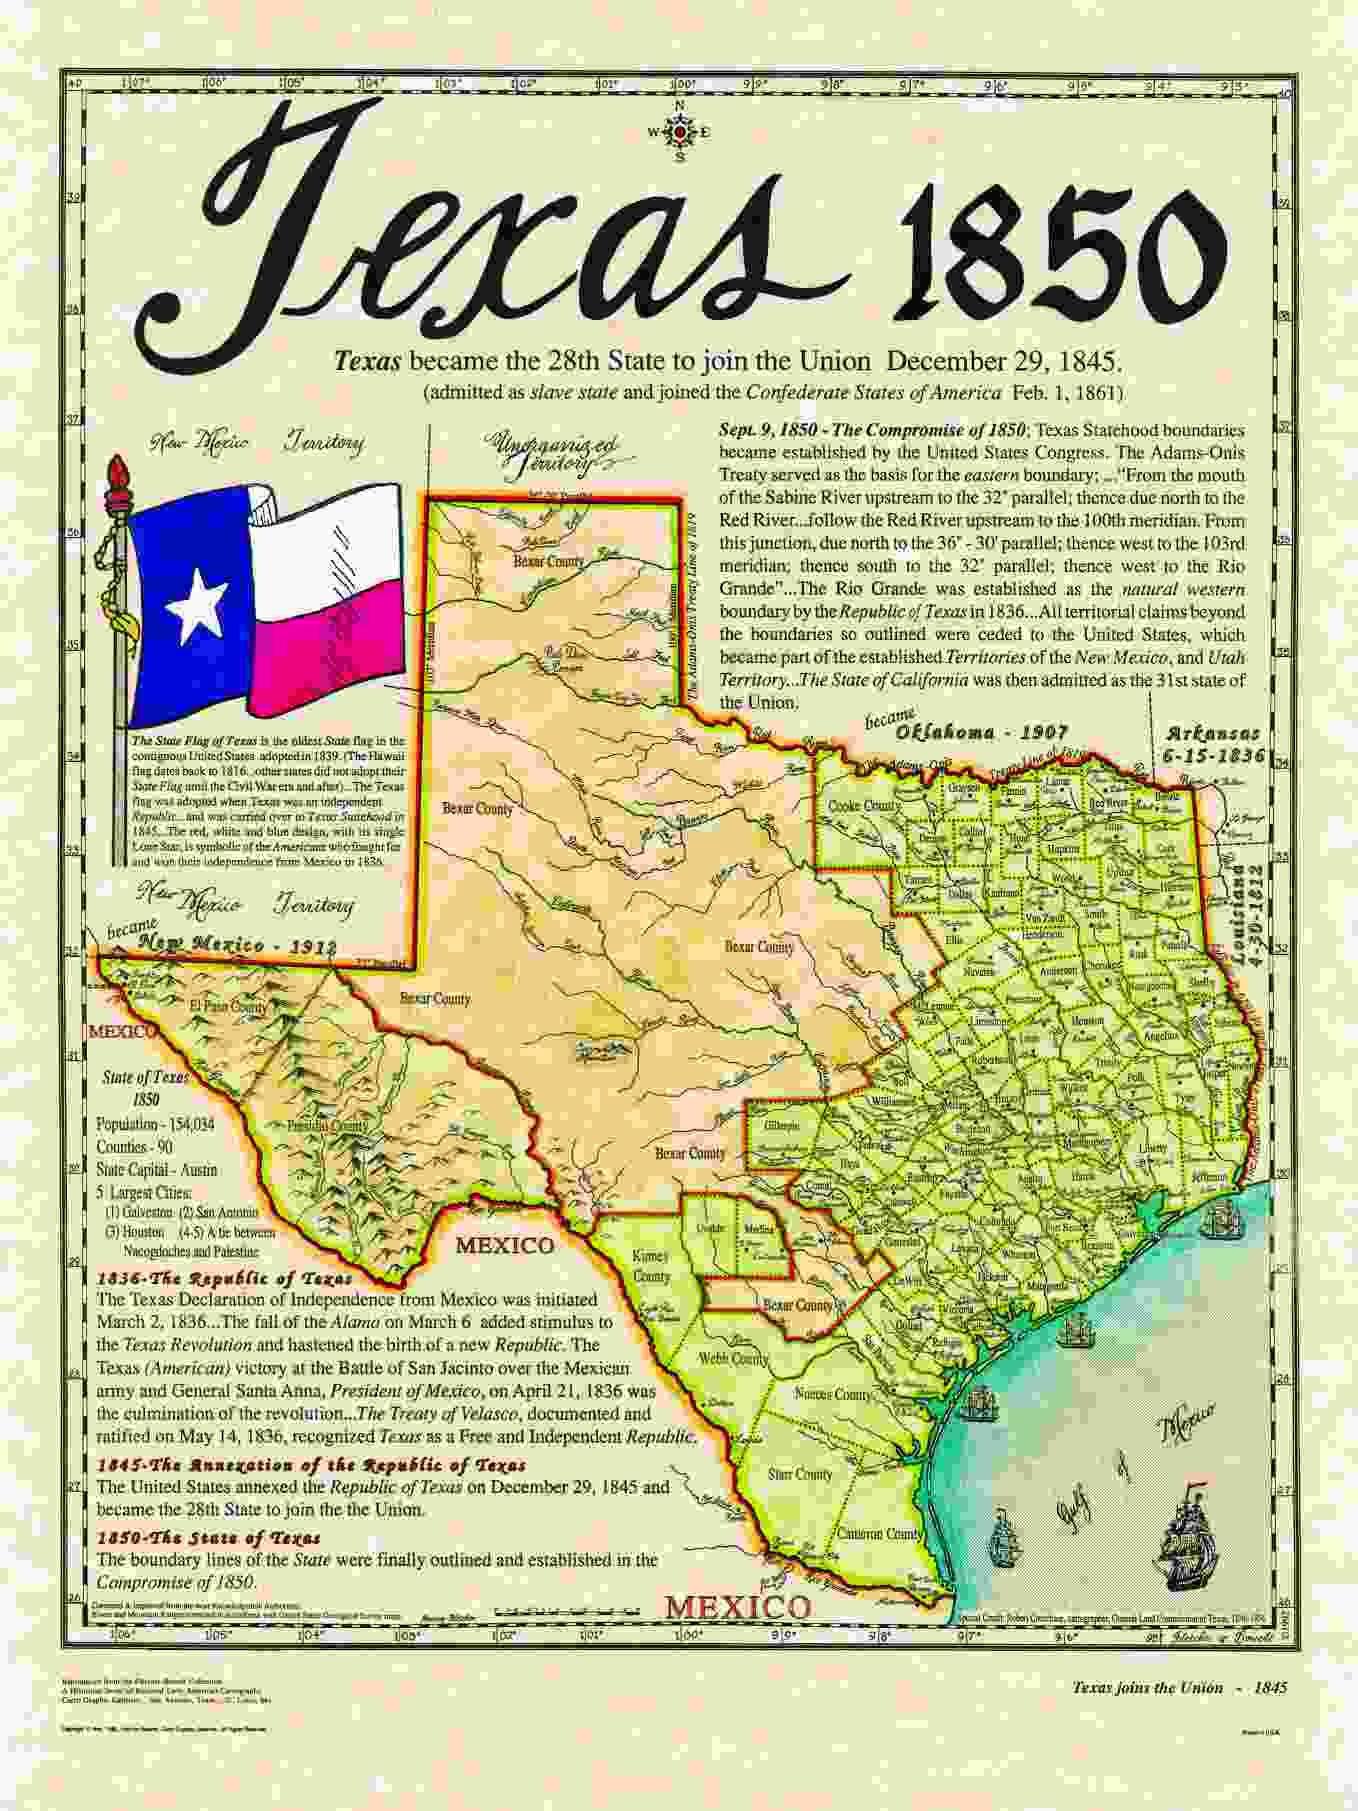 Historical Texas Maps, Texana Series | Texas History | Pinterest ...